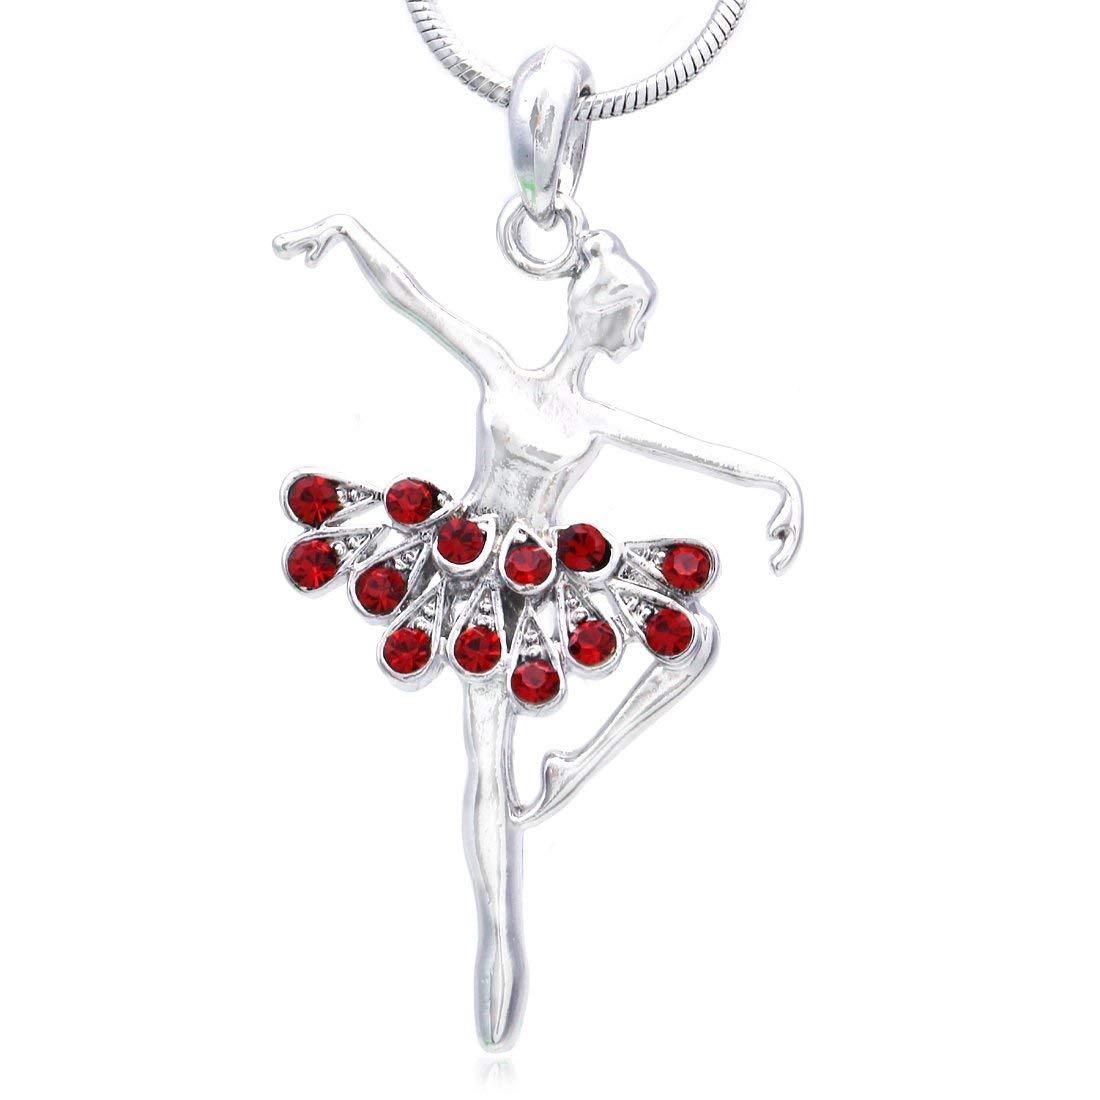 Soulbreezecollection Dancing Ballerina Dancer Ballet Dance Pendant Necklace Charm n835red